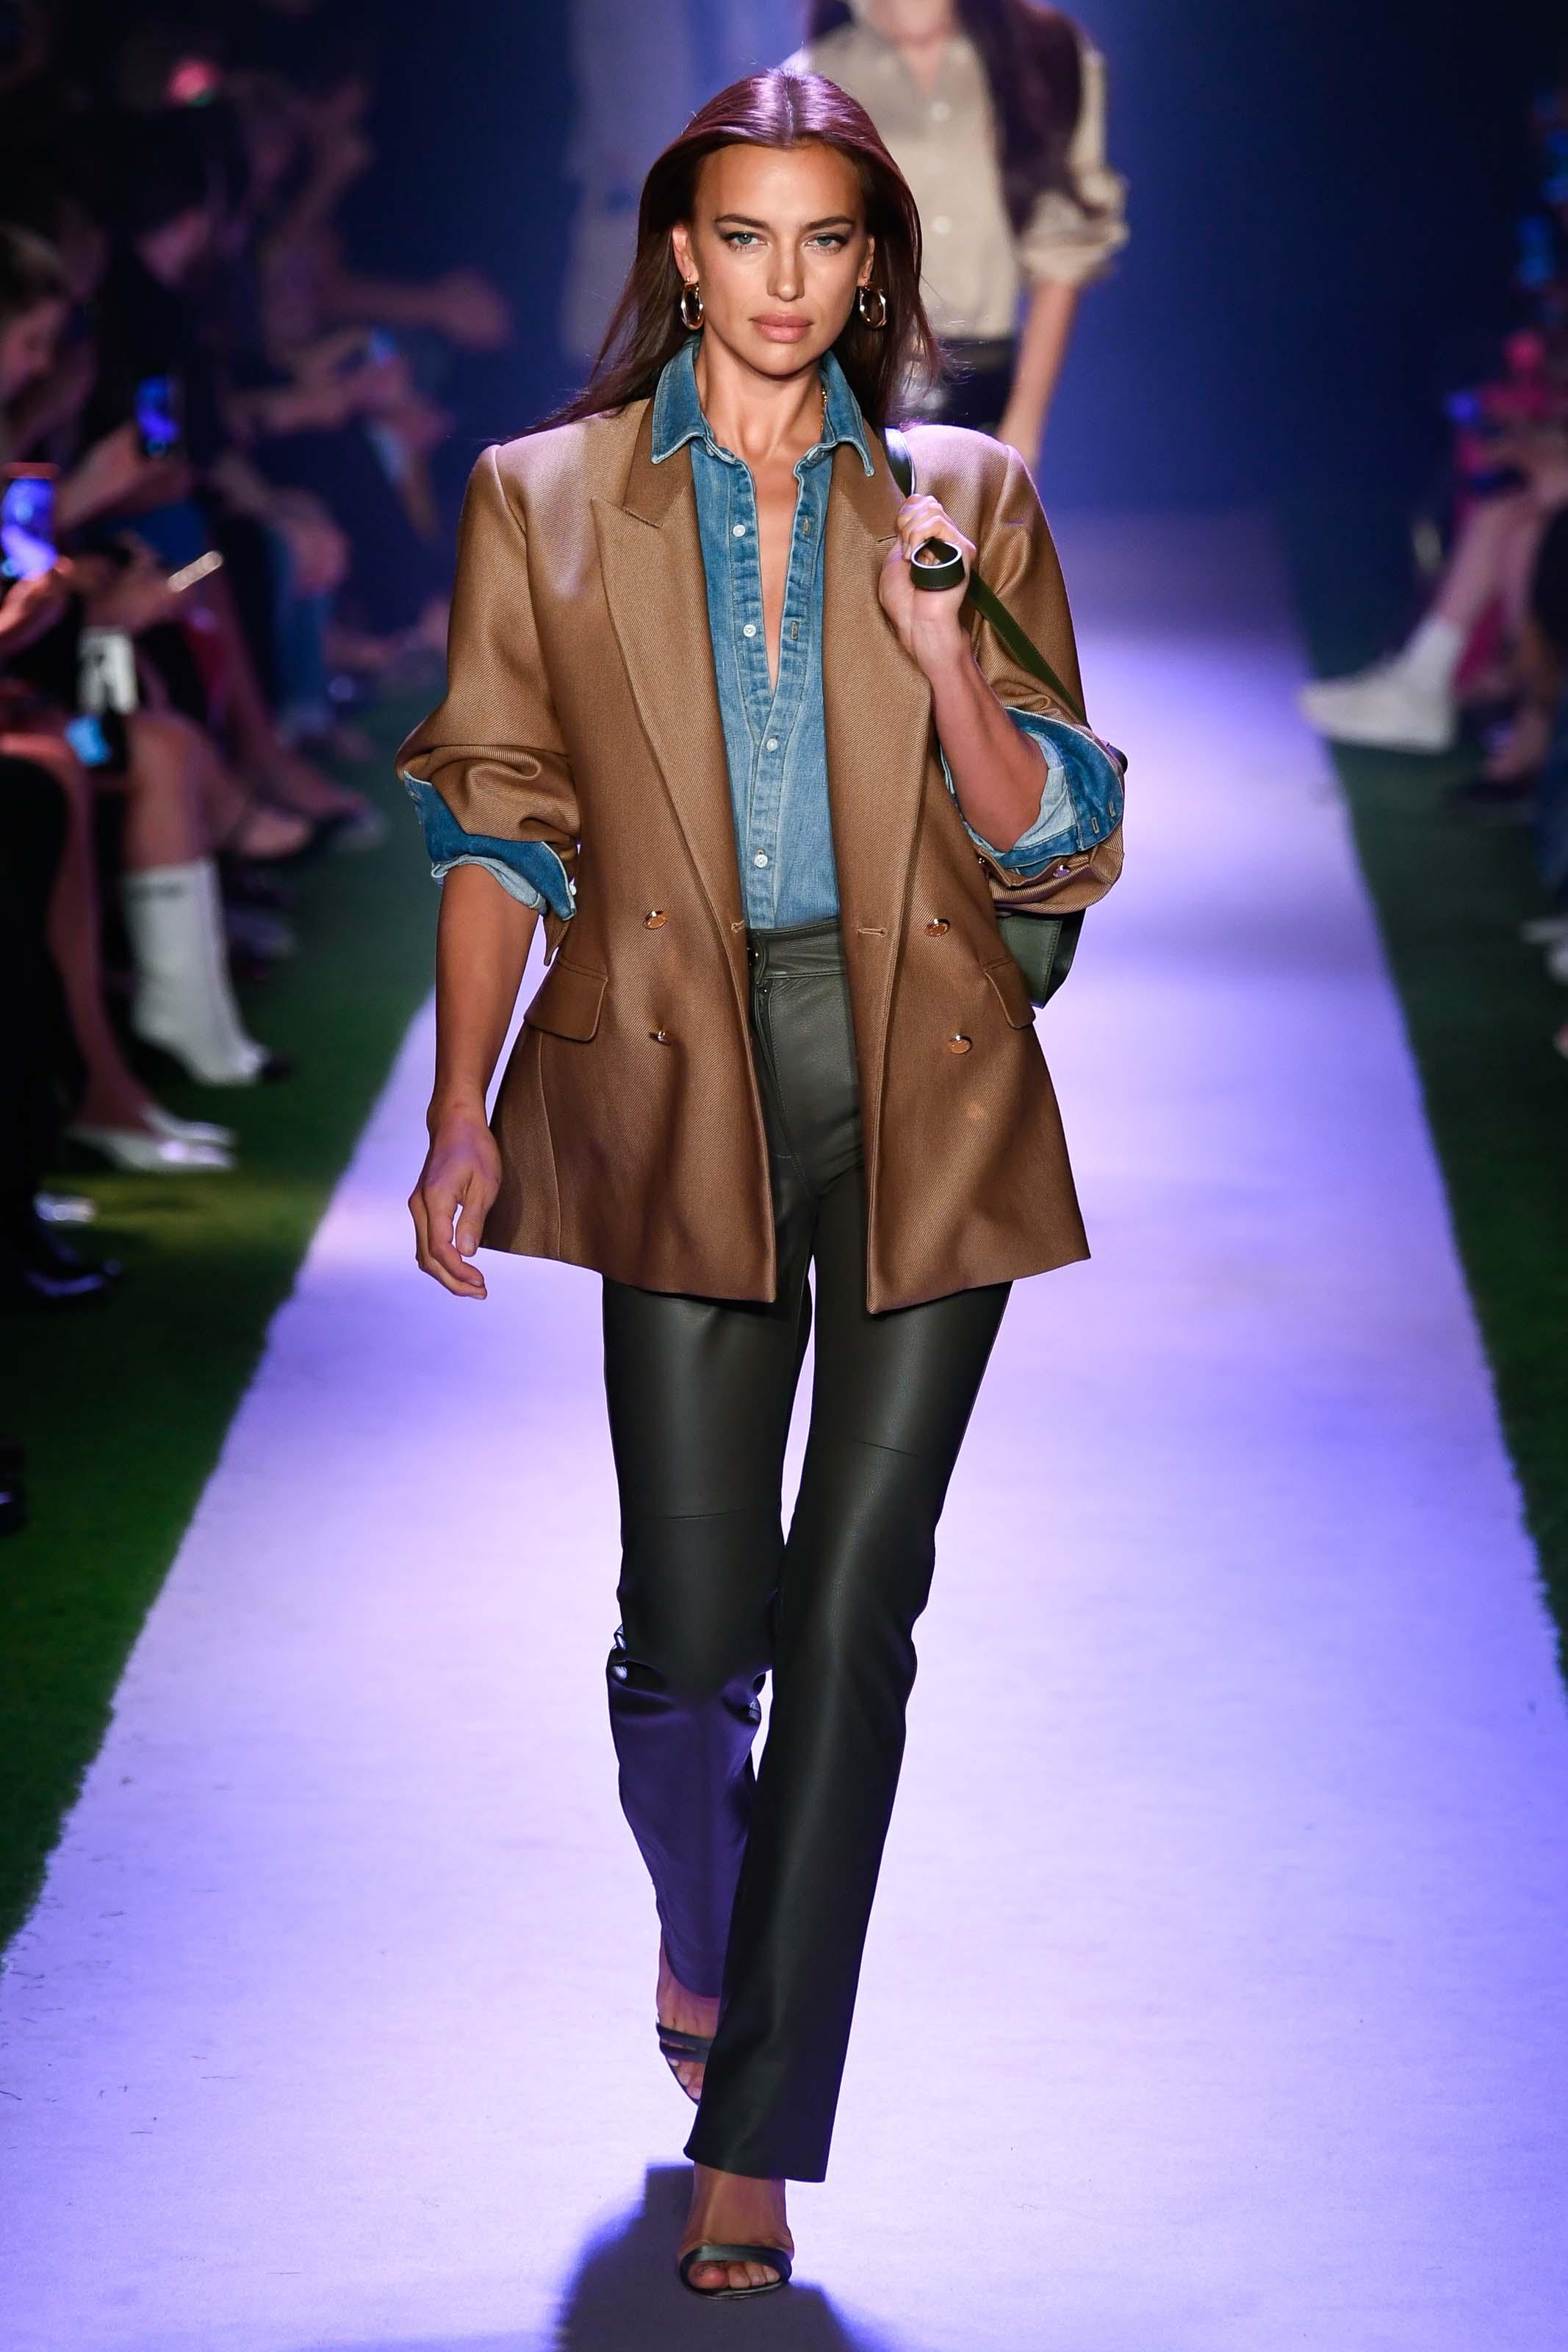 Irina Shayk attends Brandon Maxwell show